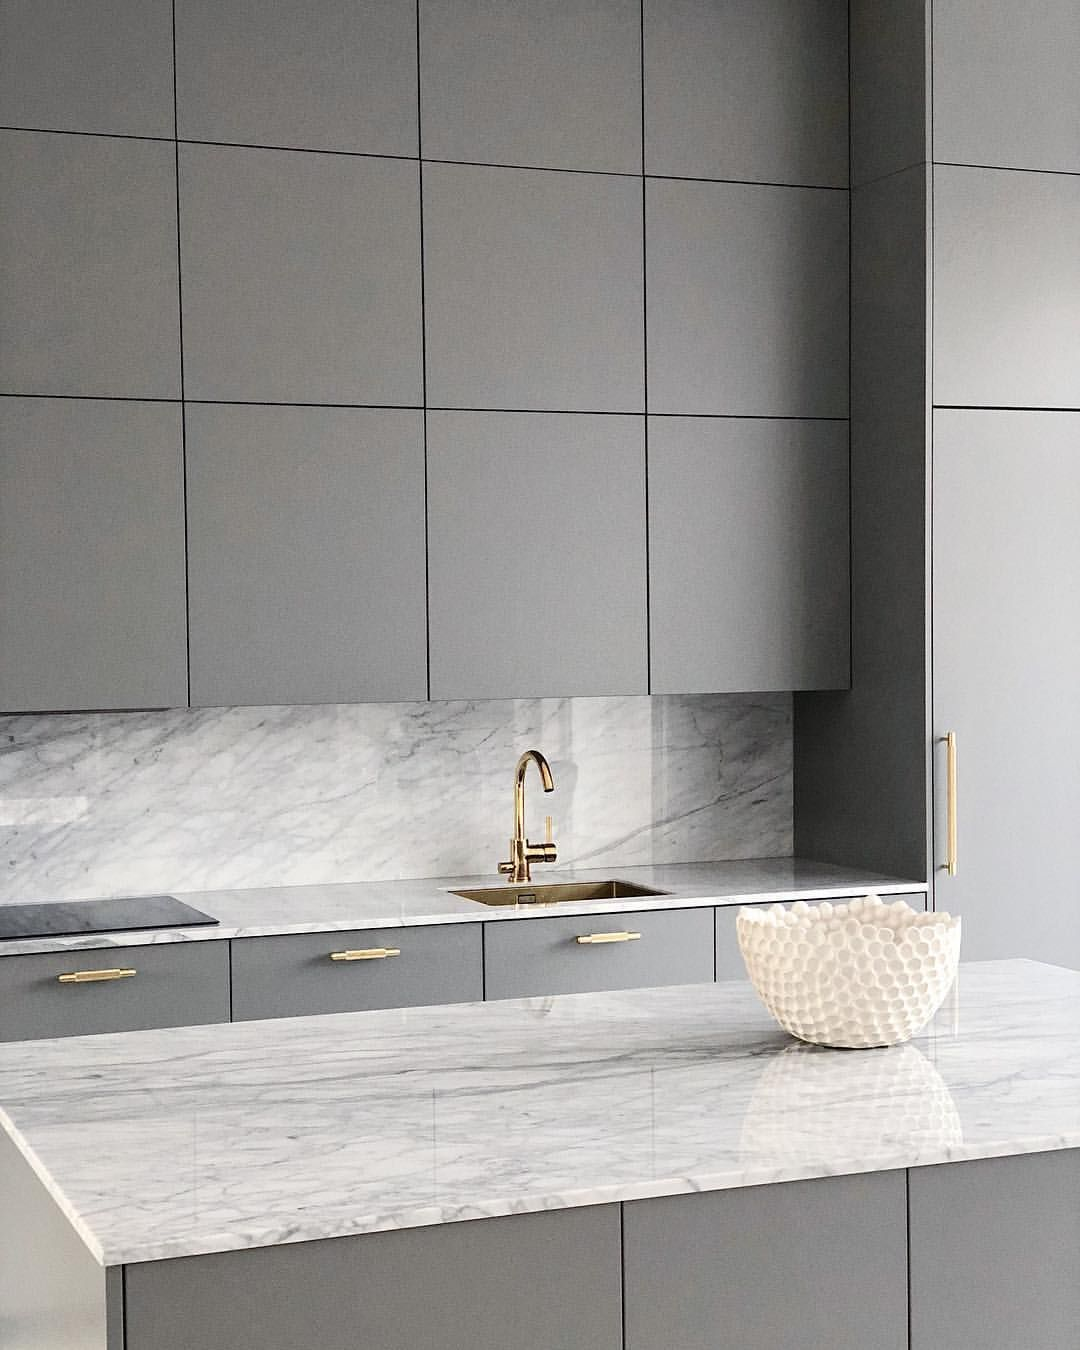 33 Modern Style Cozy Wooden Kitchen Design Ideas: Hoppas Ni Får En Fin Lördag